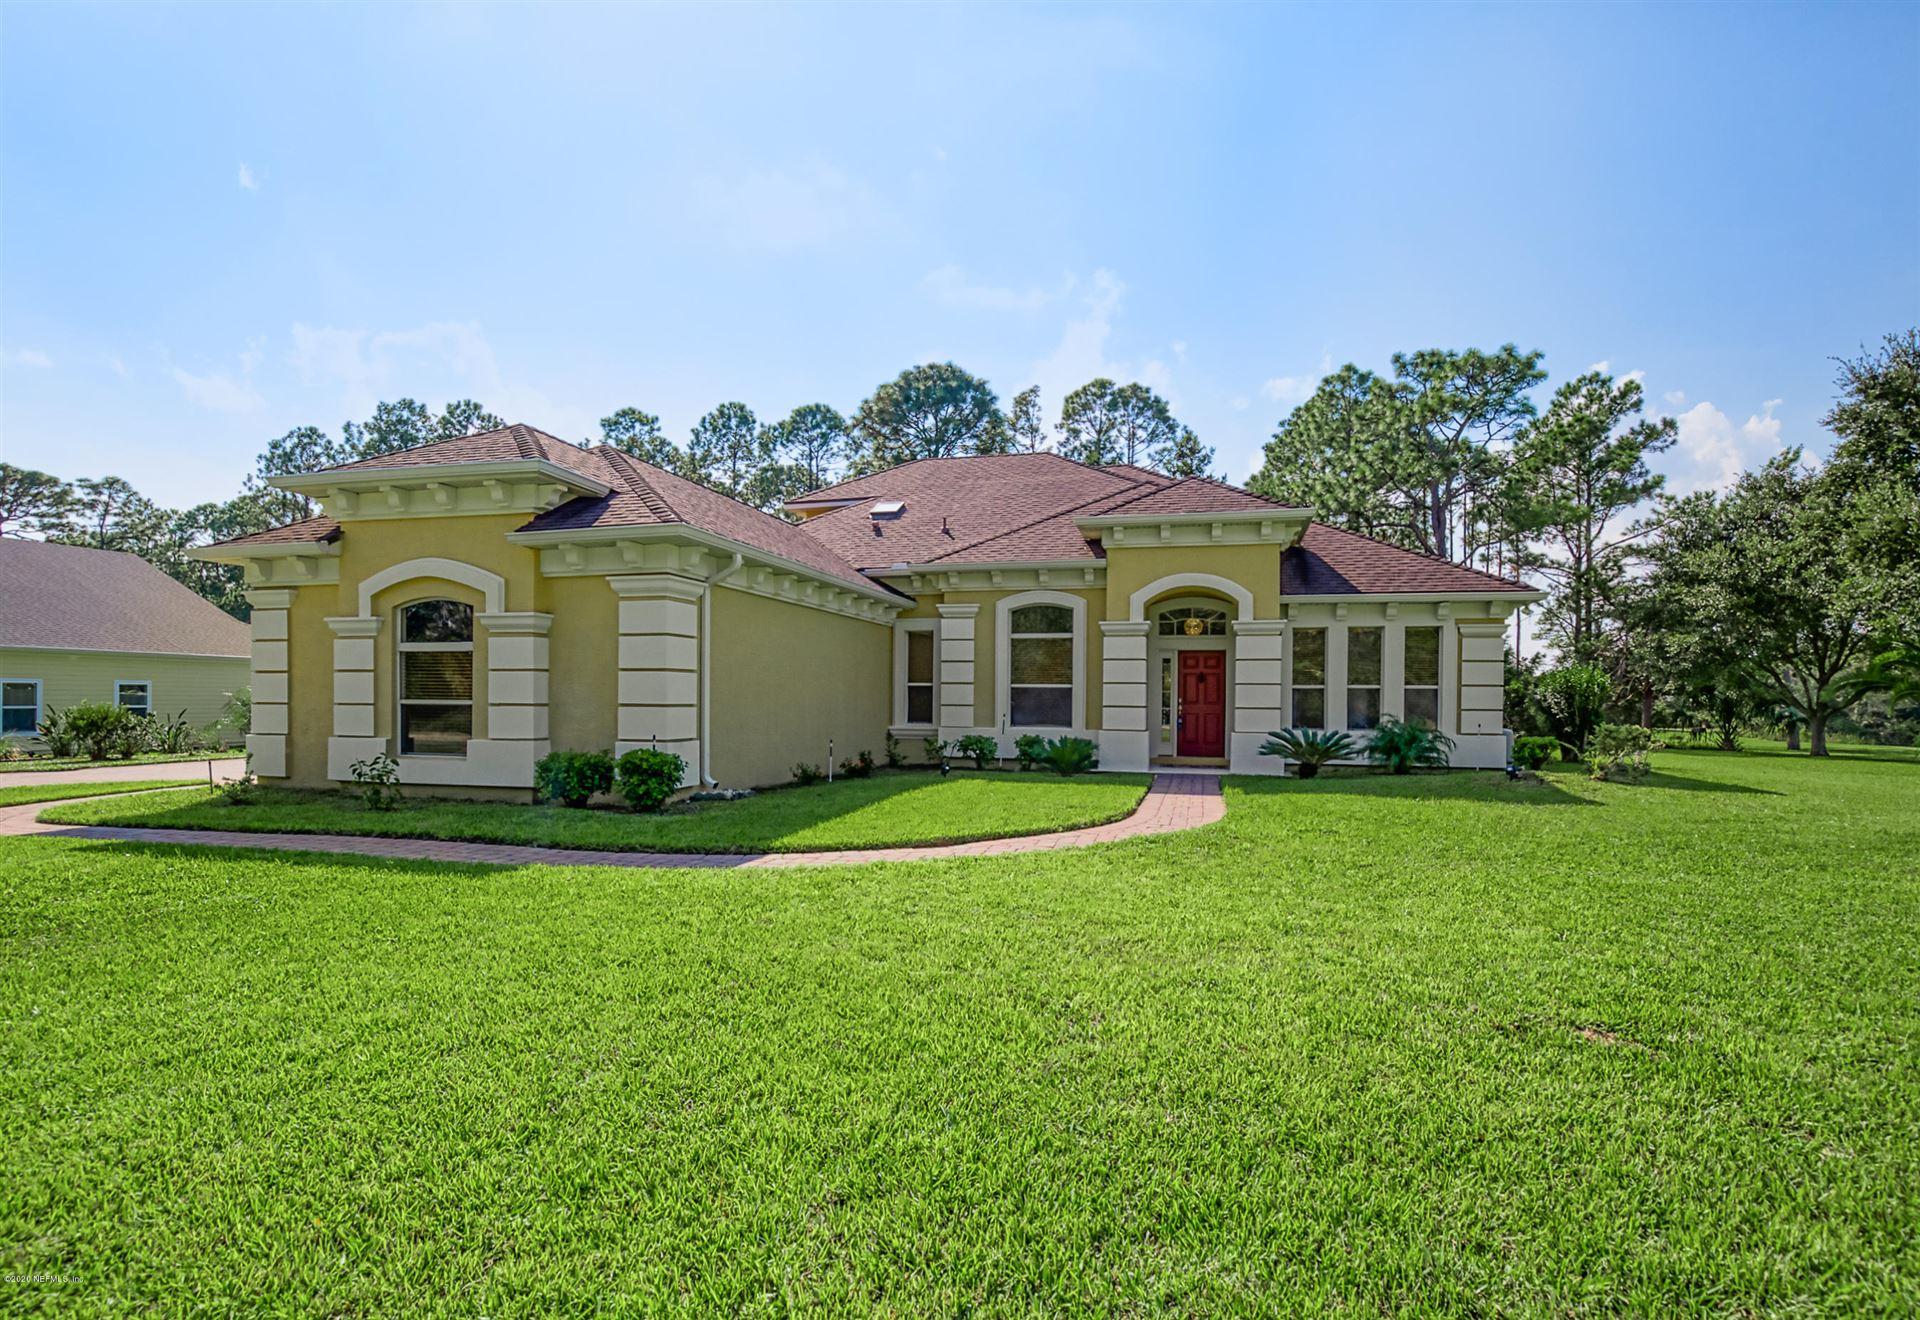 369 CORTEZ DR, Saint Augustine, FL 32086 - MLS#: 1058322